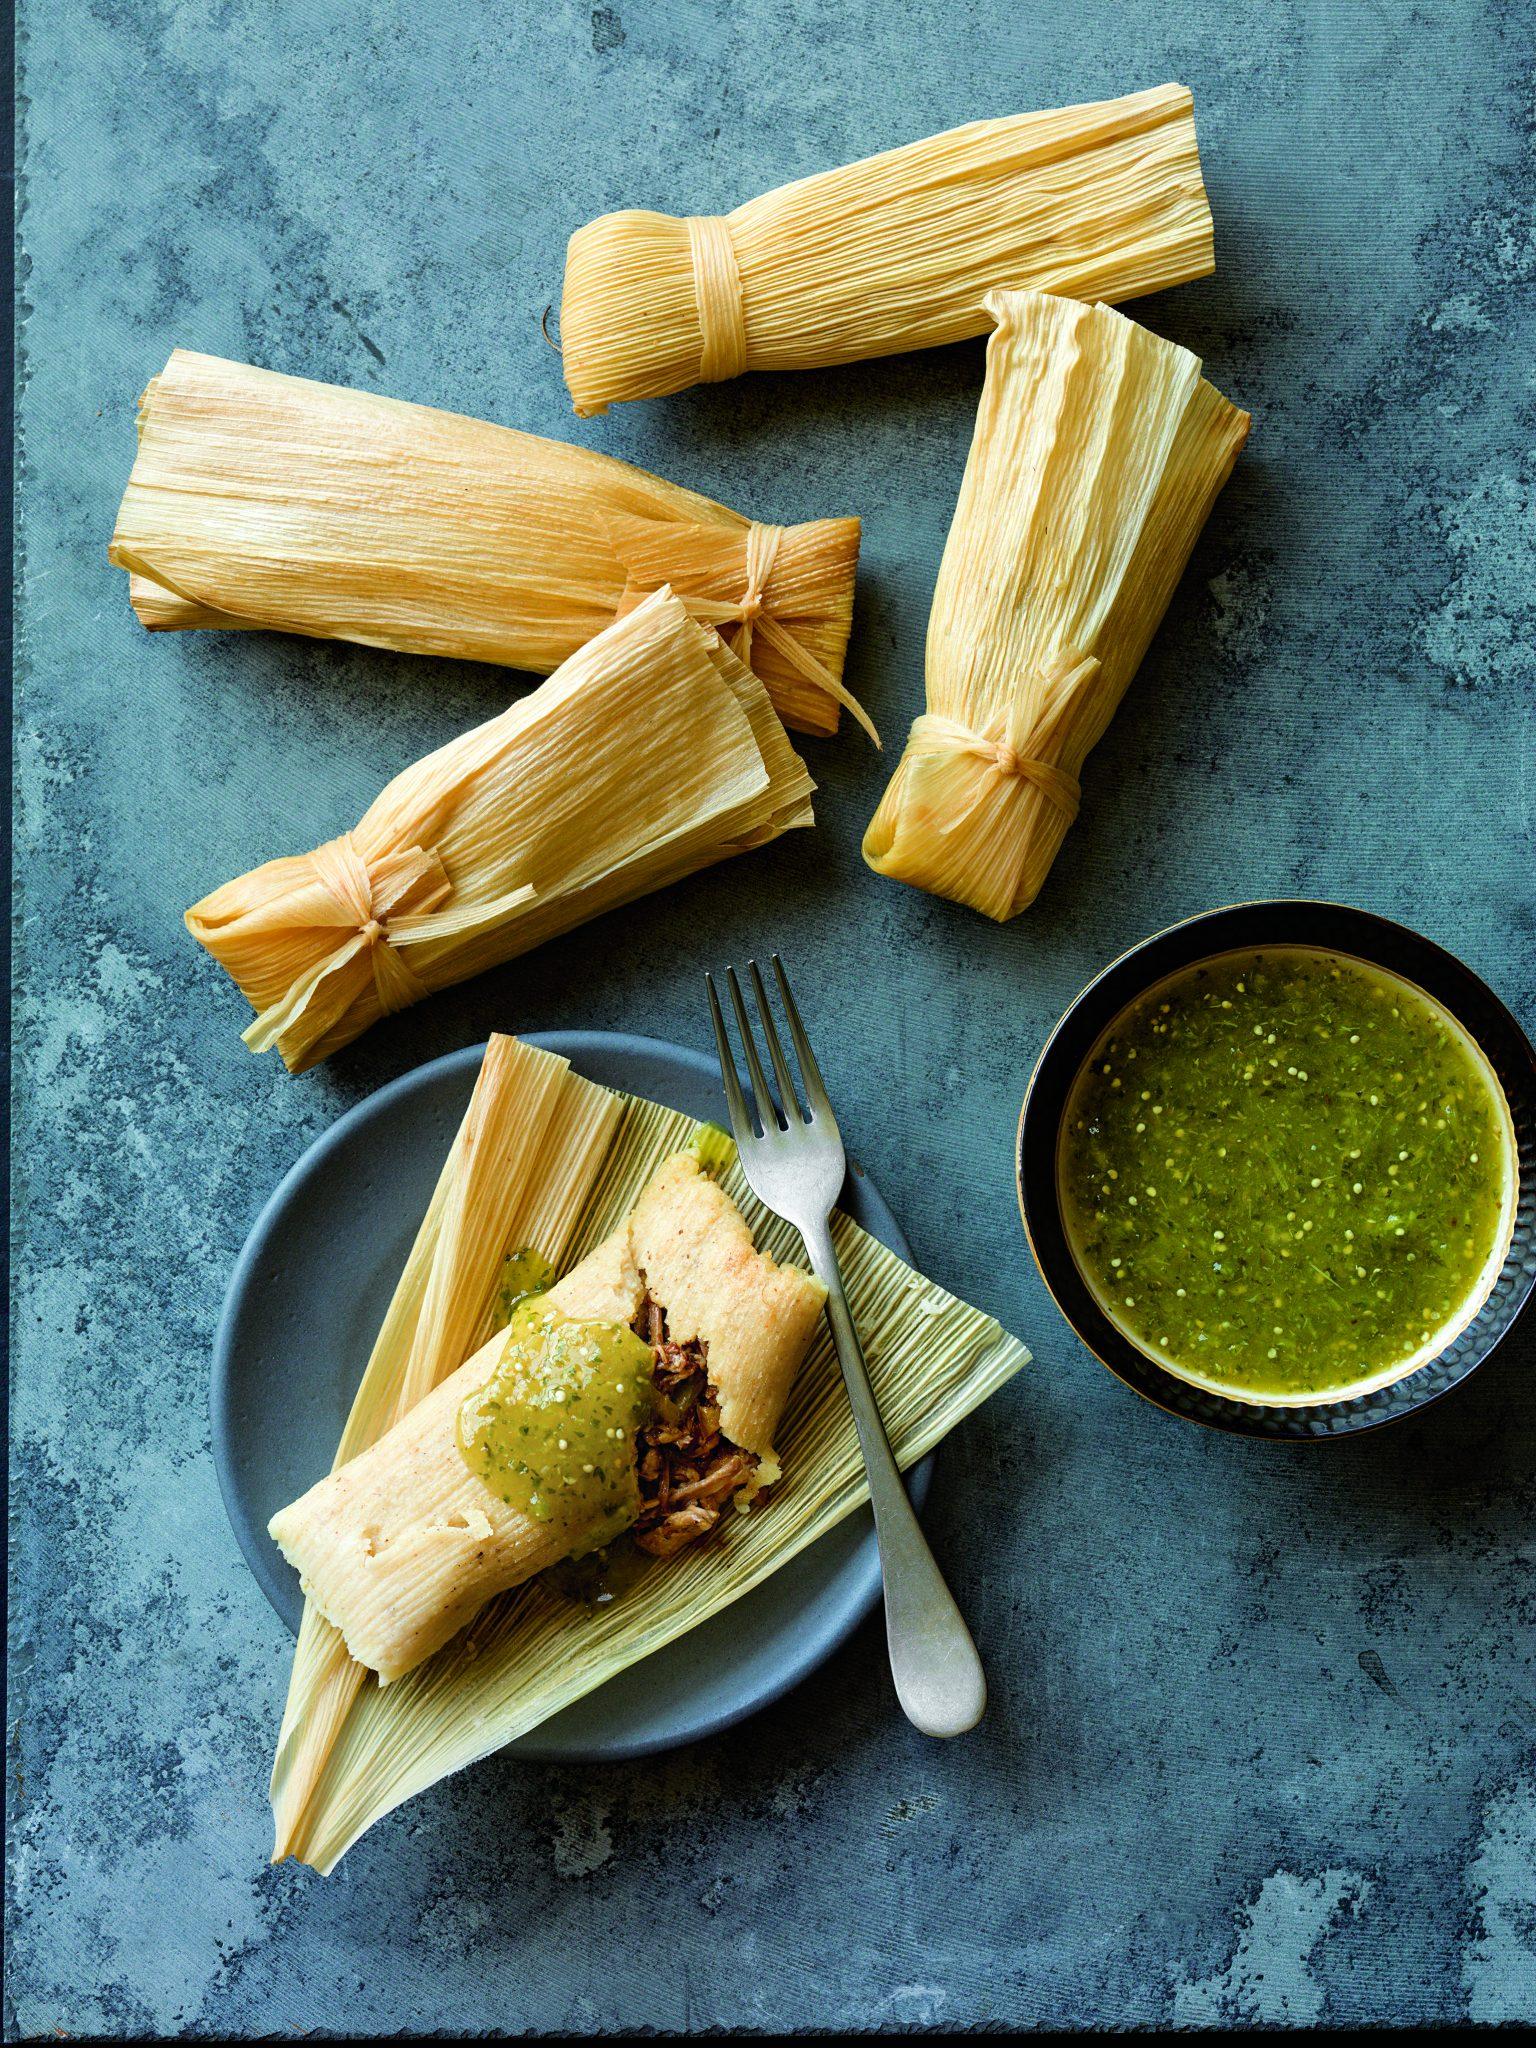 Tamale recipes